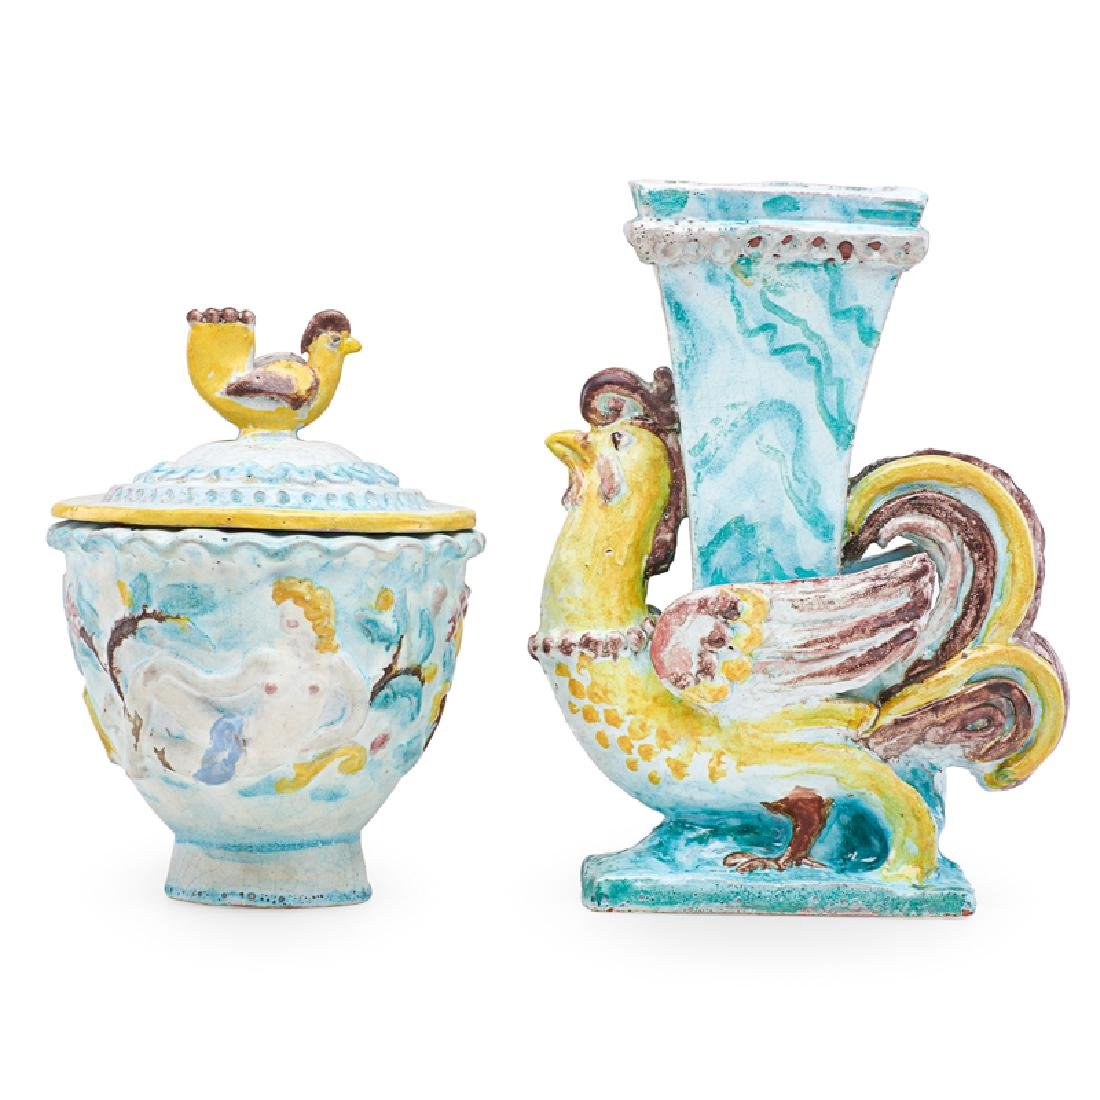 RENE BUTHAUD Vase and lidded vessel